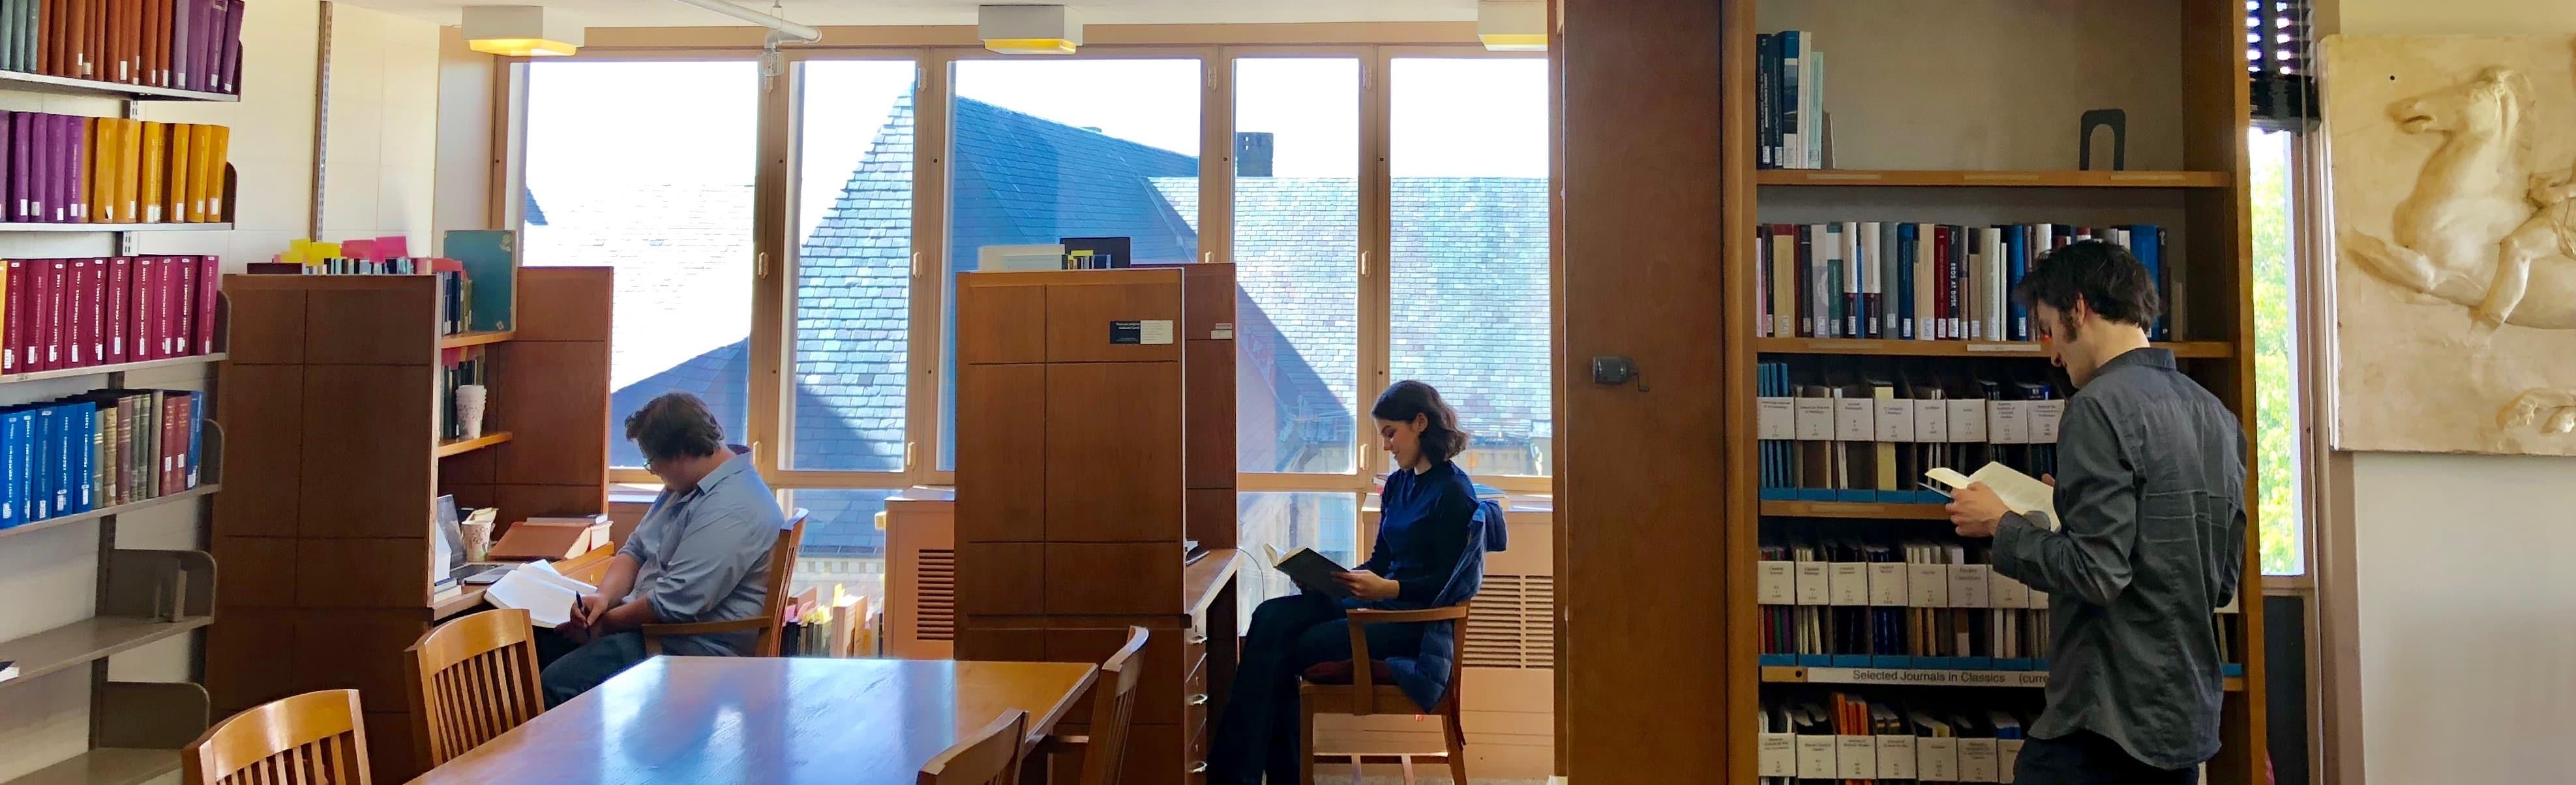 Classics Graduate Study Room, Olin LIbrary